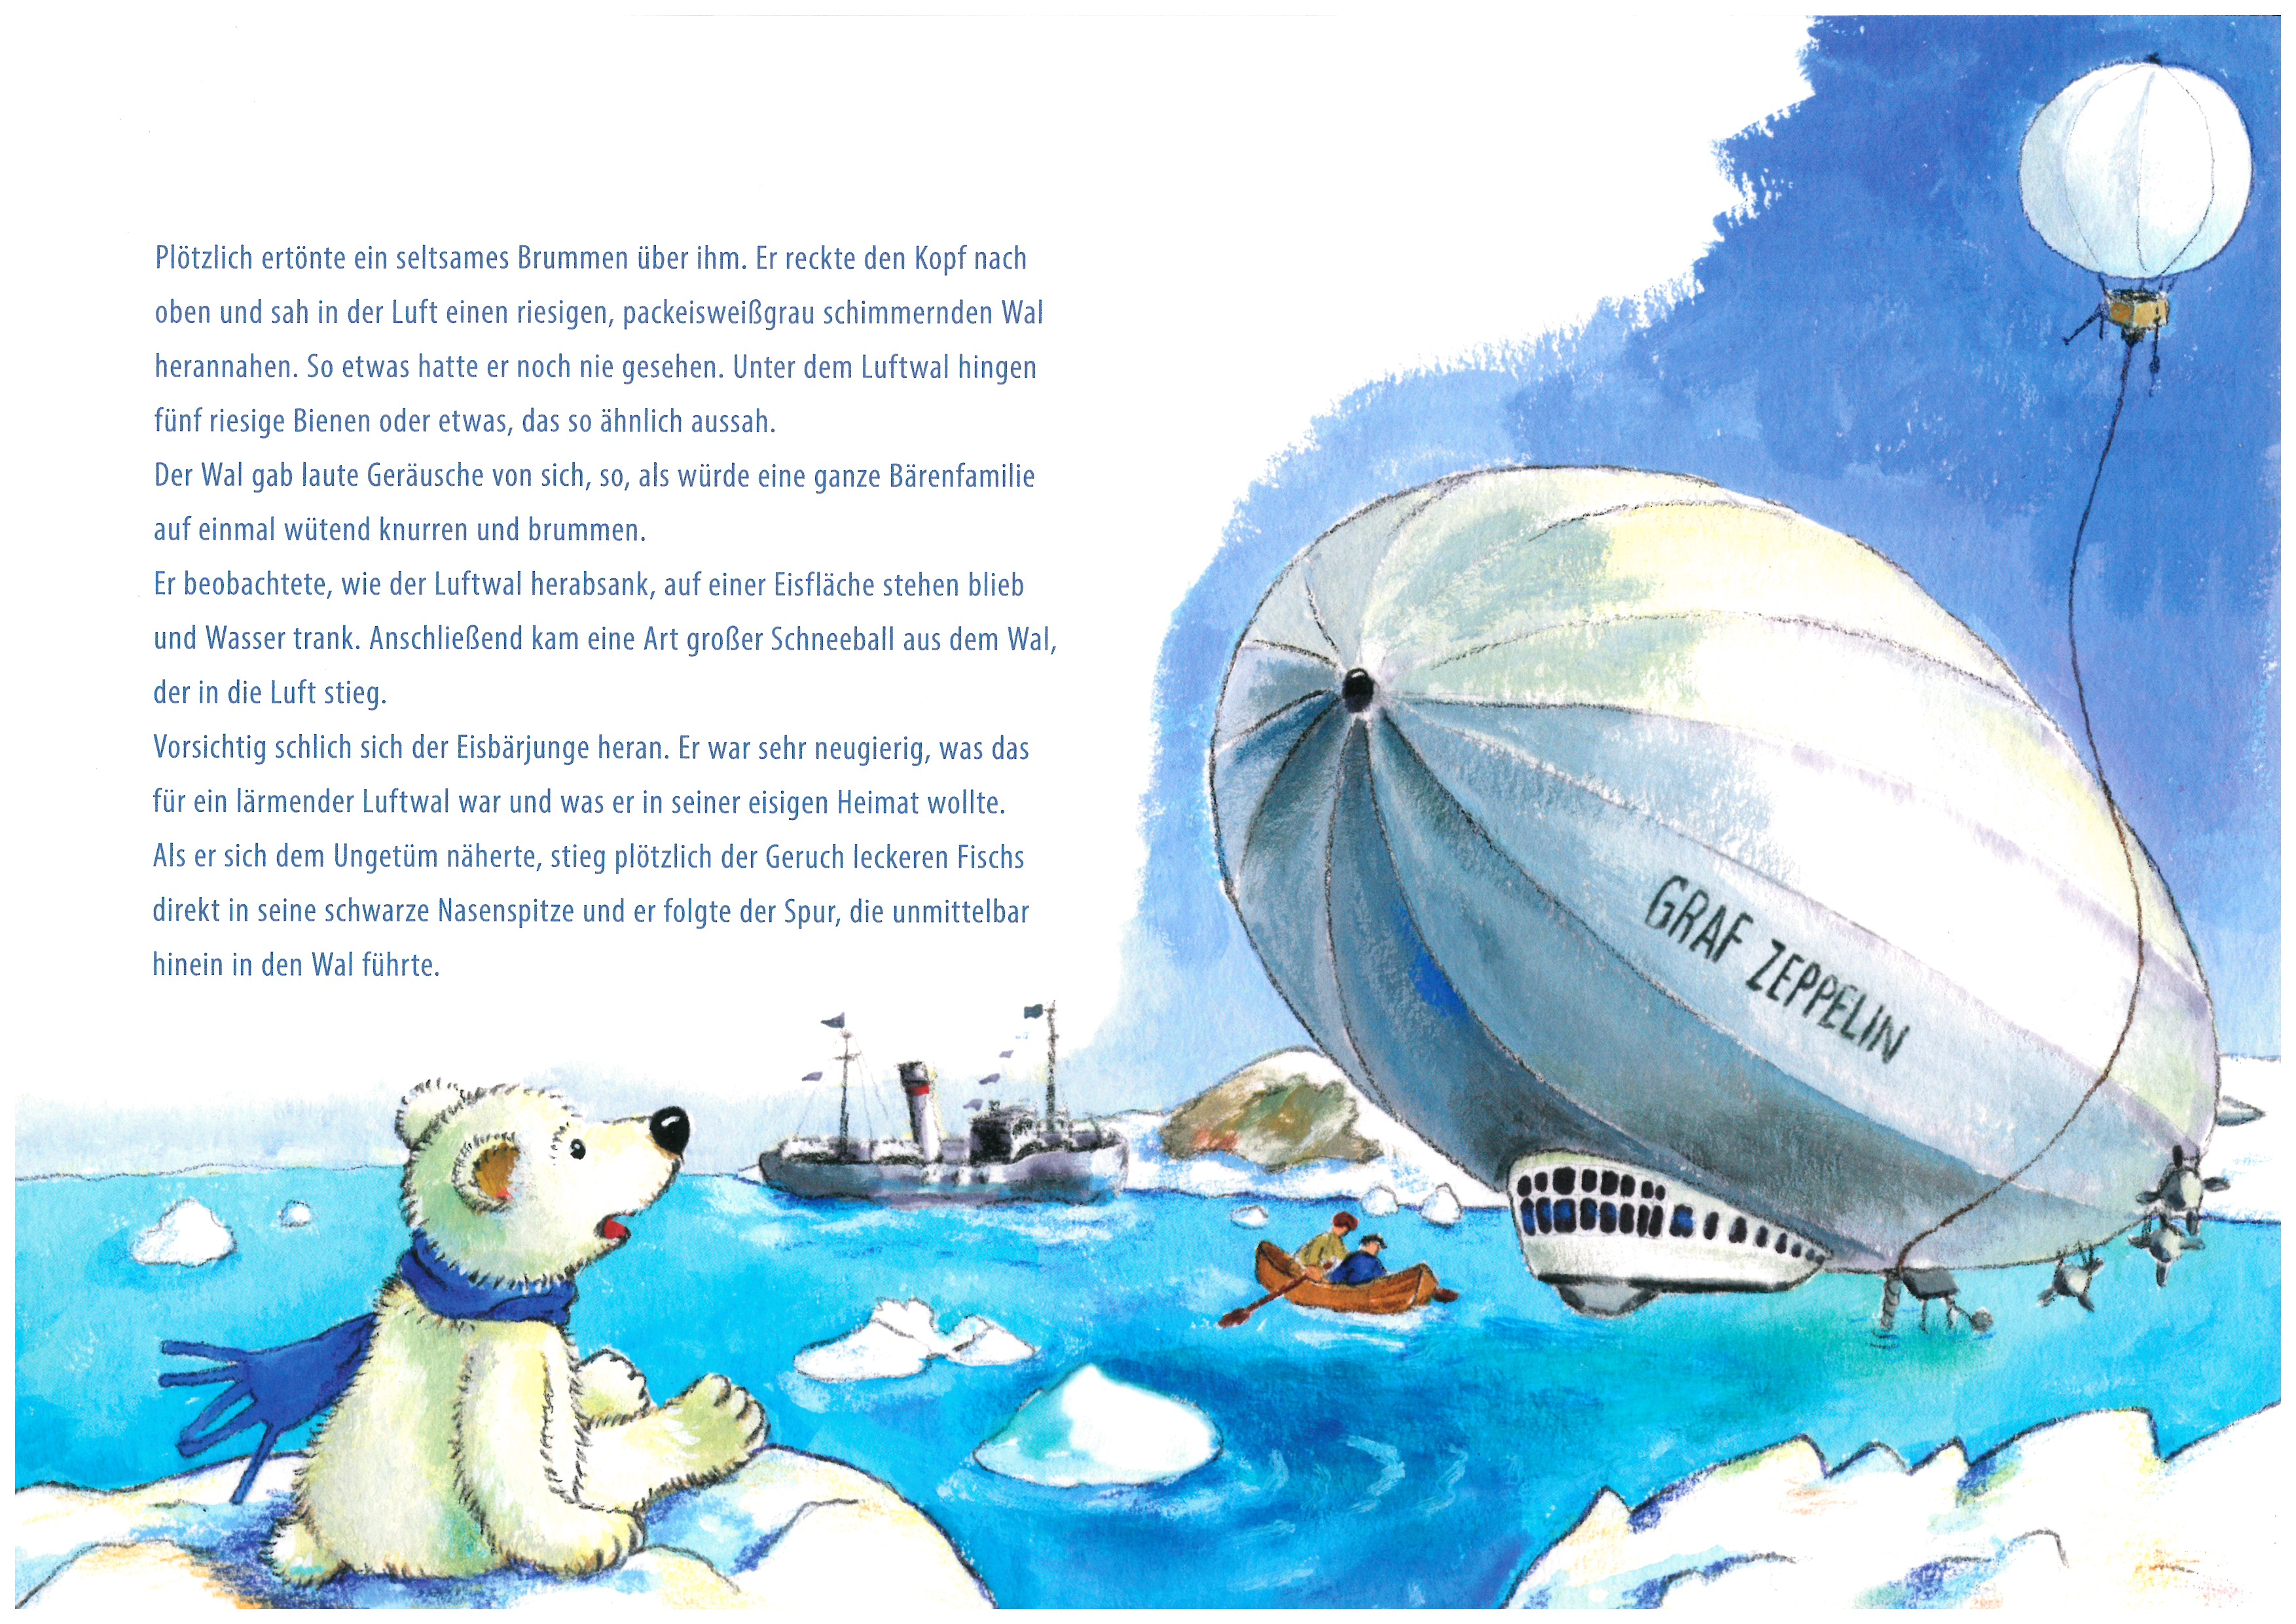 Sabine Ochaba: Hugos Arktisfahrt - Ein Eisbär entdeckt den Zeppelin